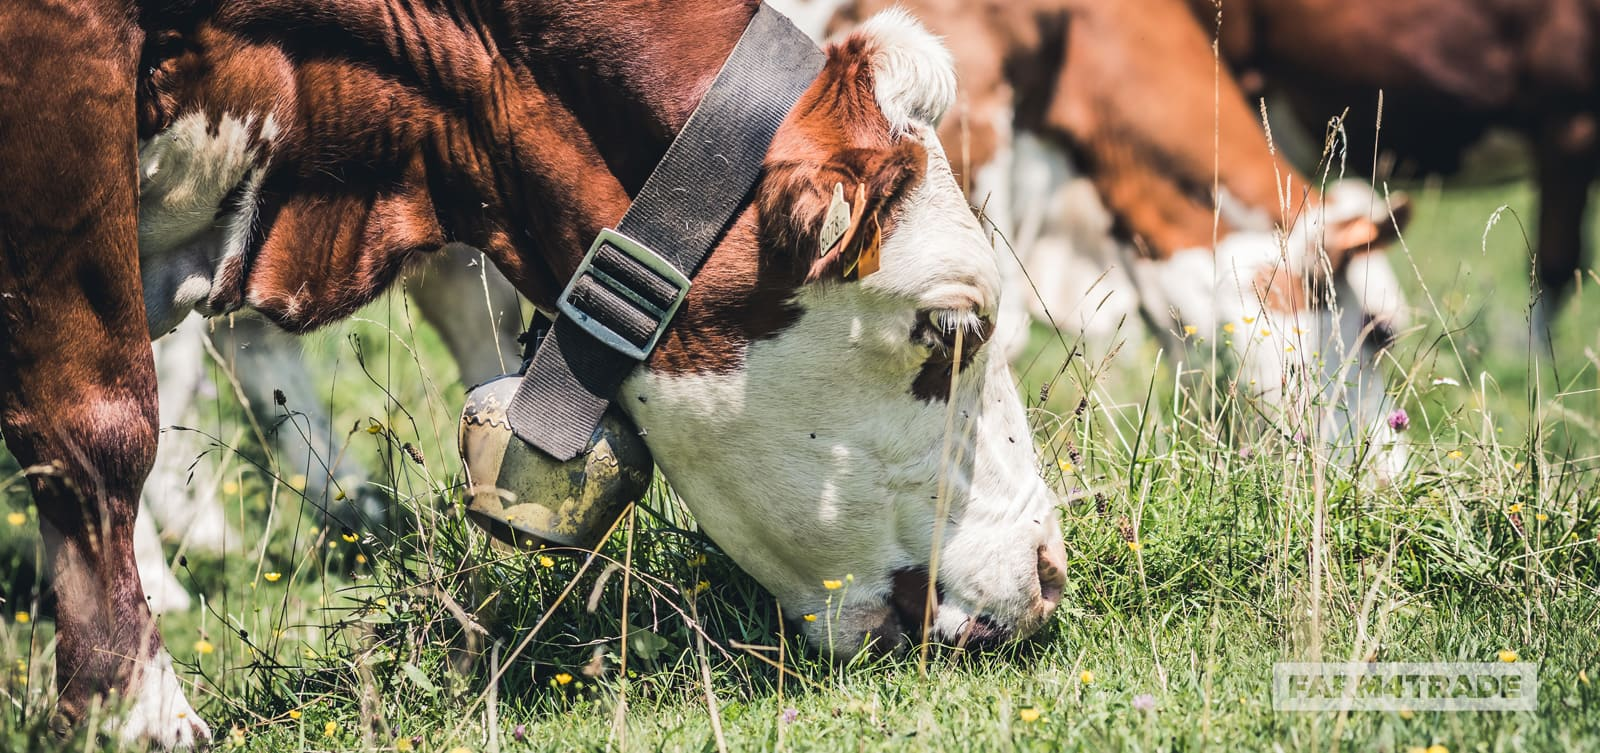 Farm4Trade-methods of estimating forage intake of grazing animals.